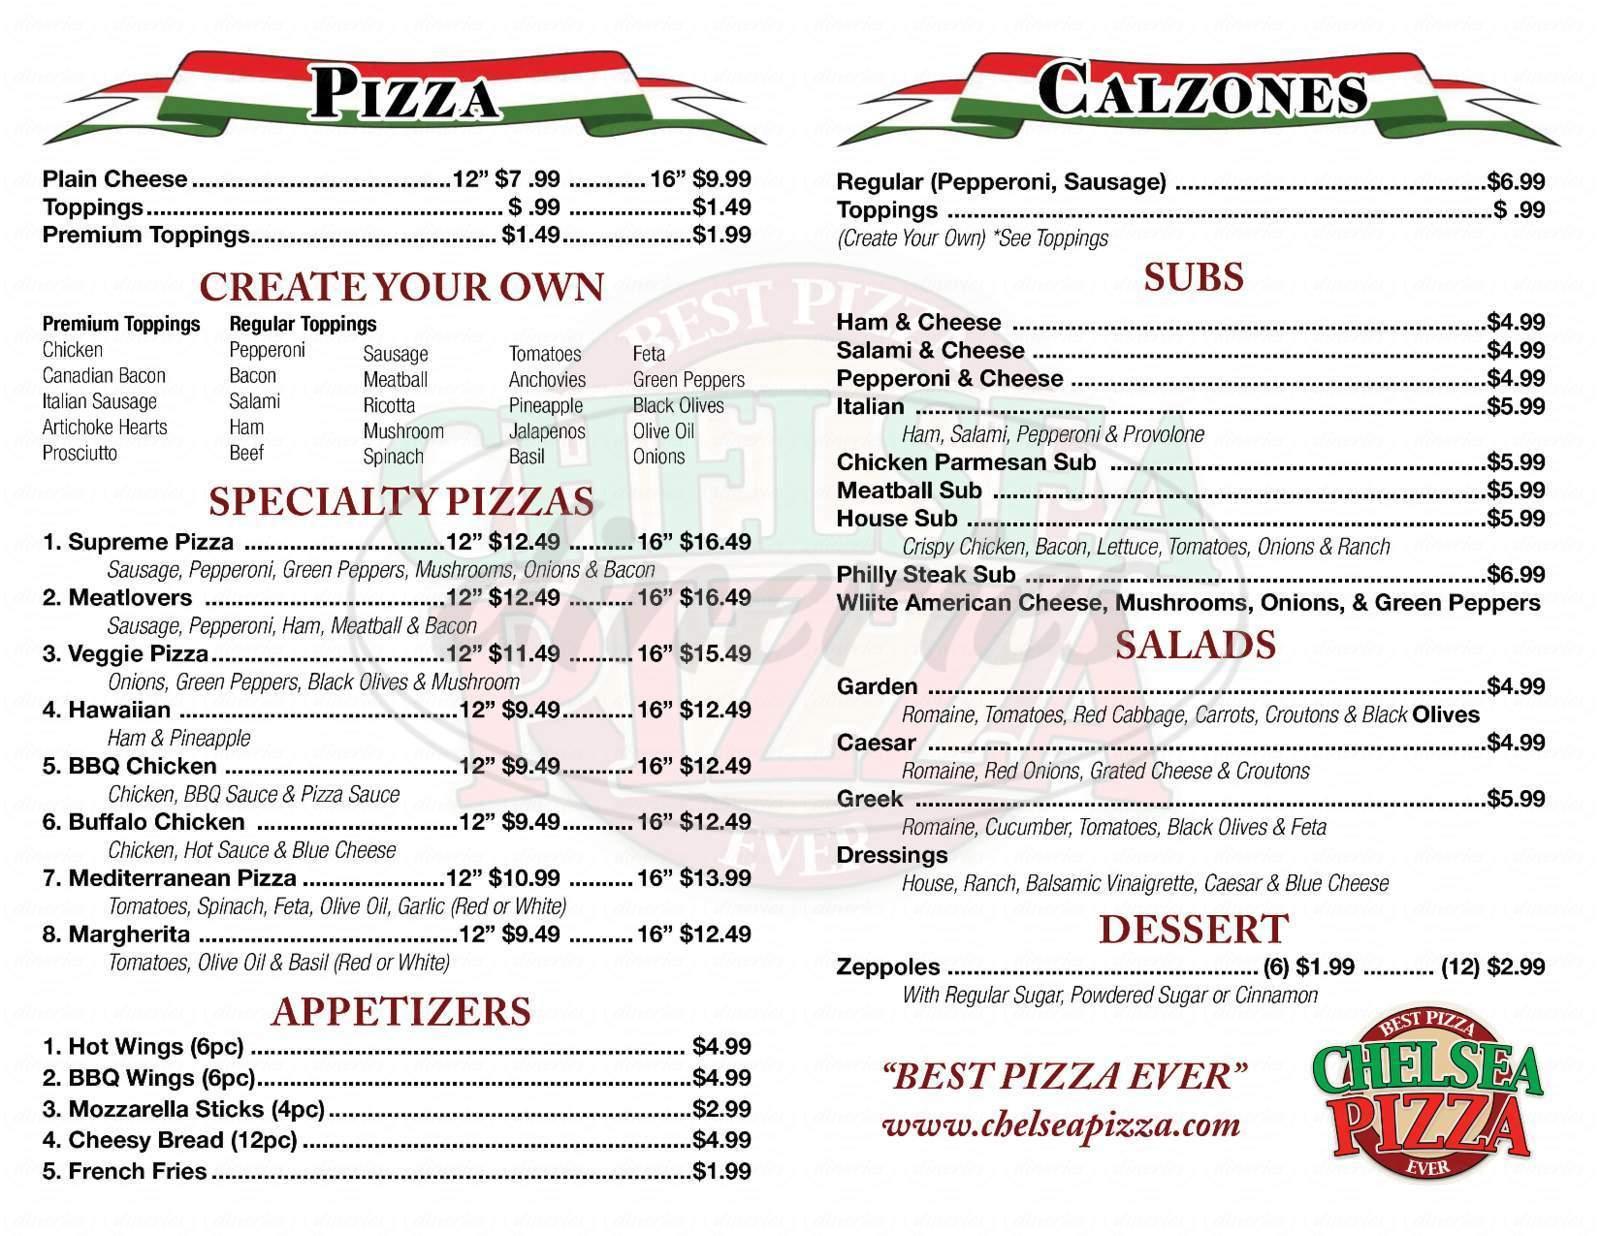 menu for Chelsea Pizza